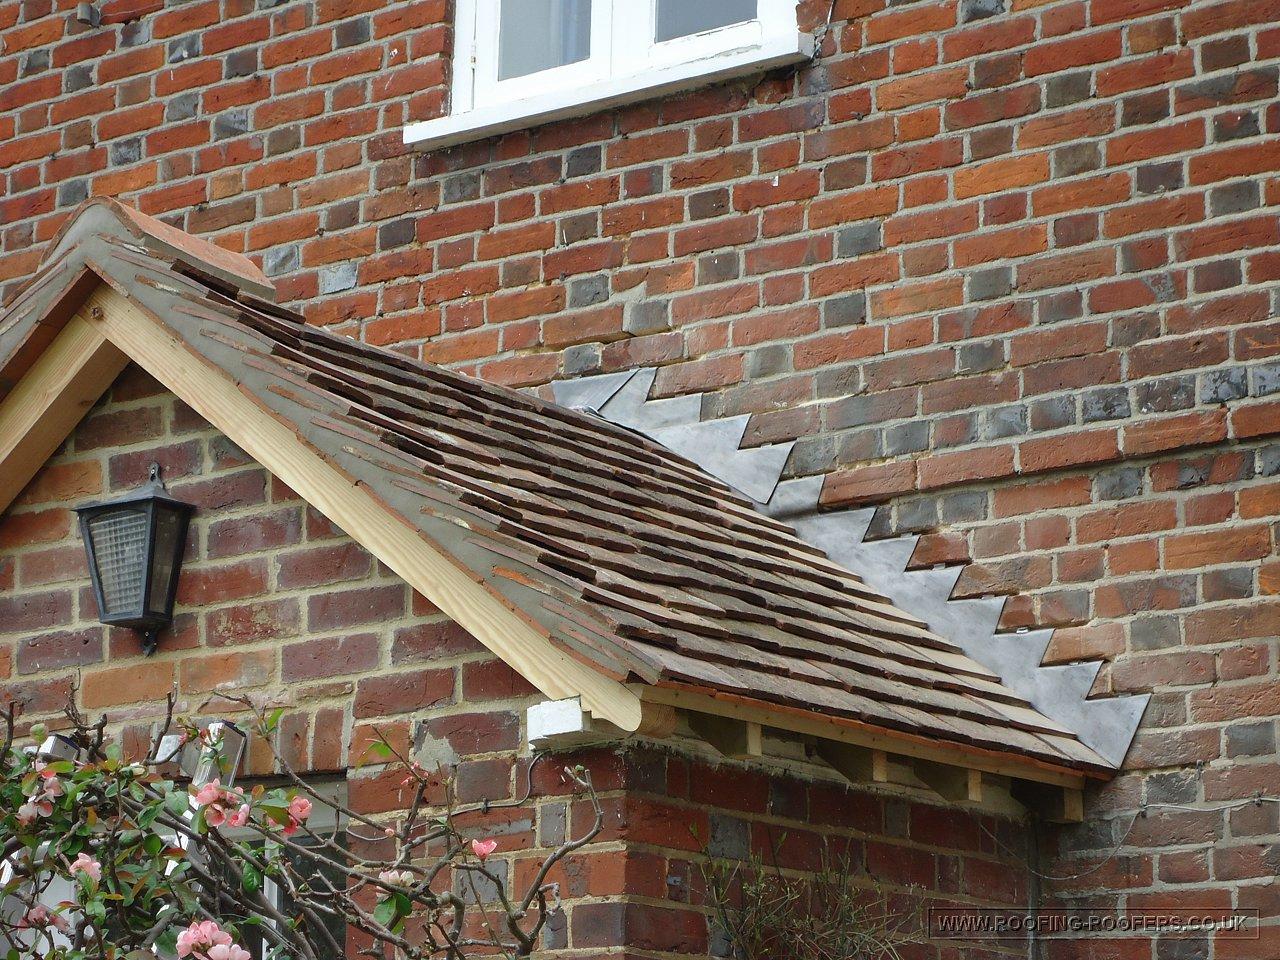 Roof Tile Roof Tile Undercloak